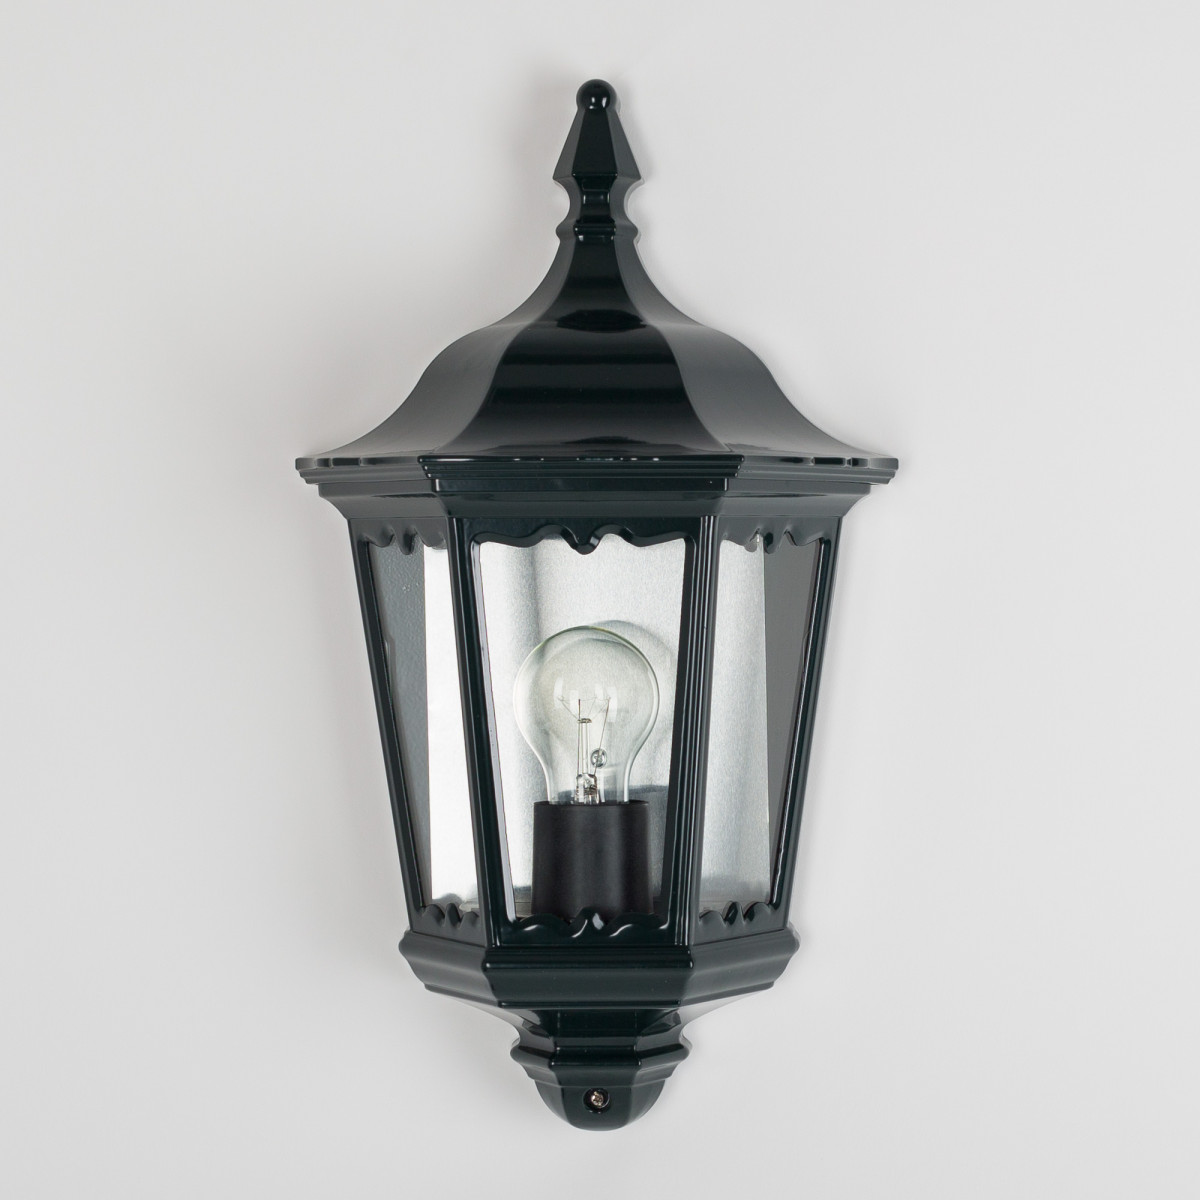 Buitenlamp Ancona plat Dag Nacht sensor LED Schemersensor